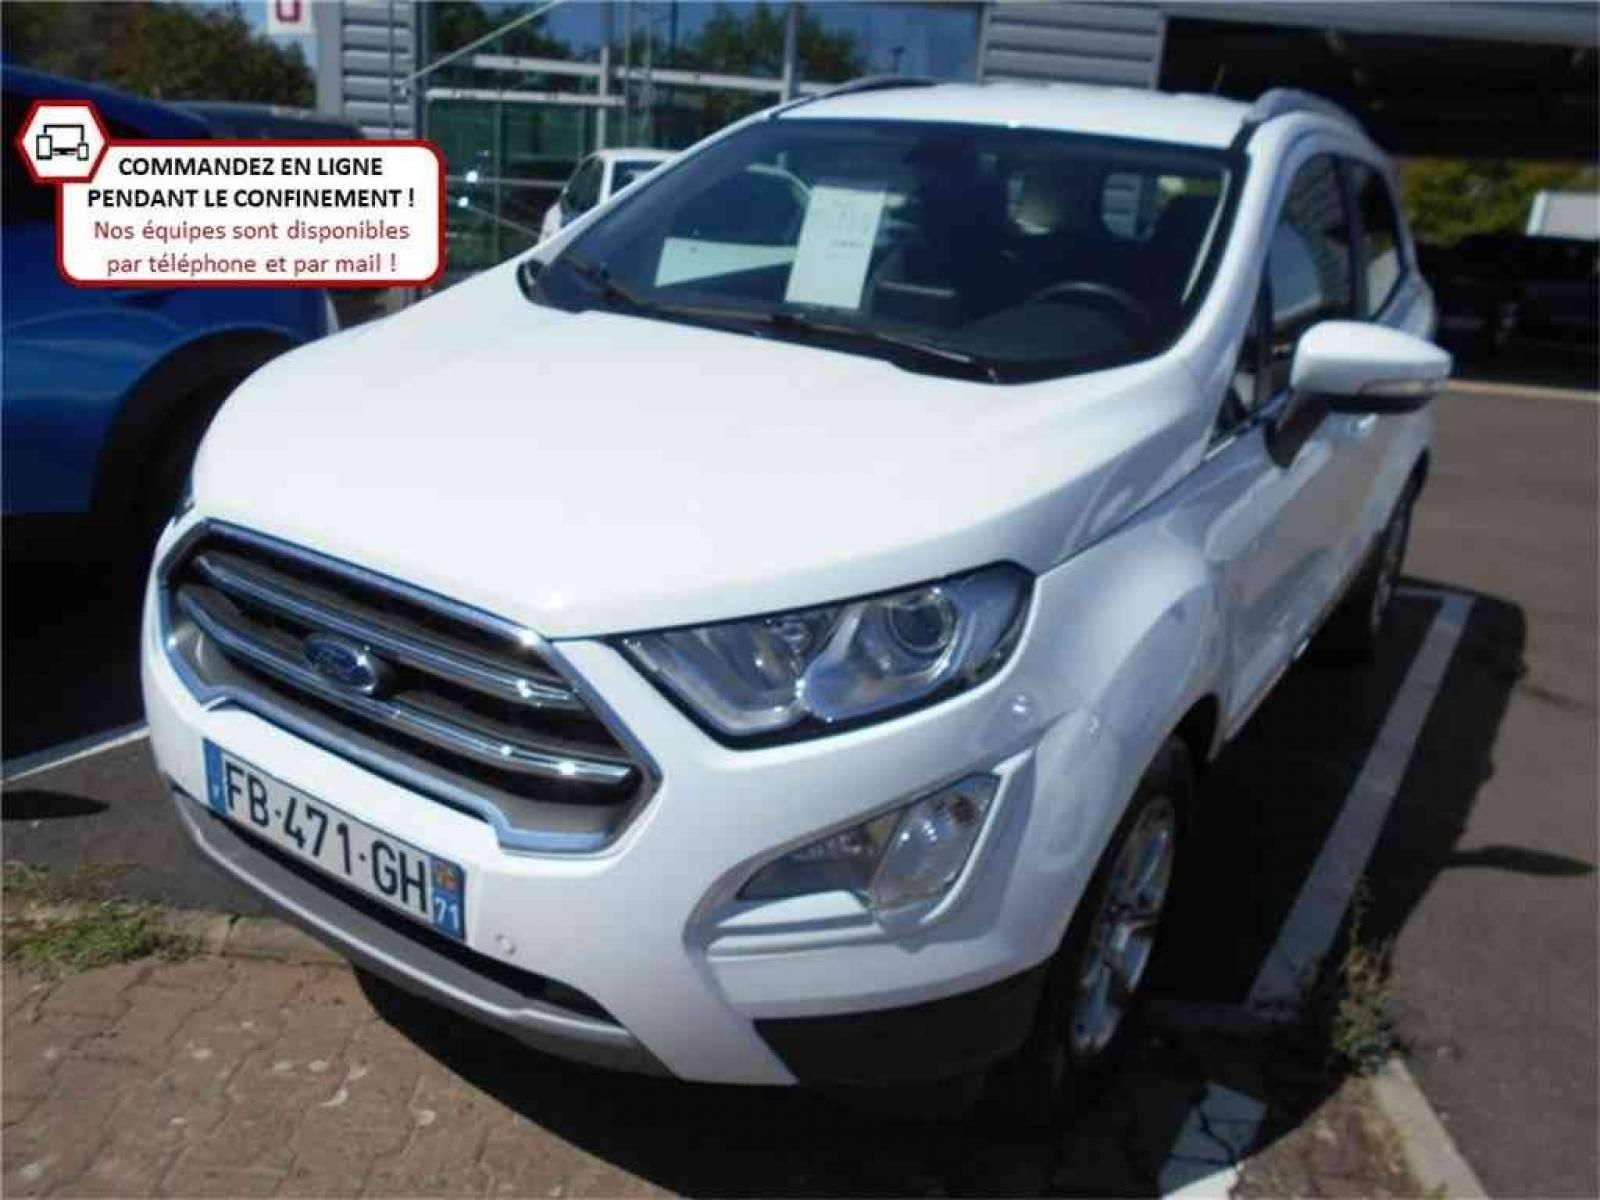 FORD EcoSport 1.0 EcoBoost 125 BVM6 - véhicule d'occasion - Groupe Guillet - Chalon Automobiles - 71100 - Chalon-sur-Saône - 1